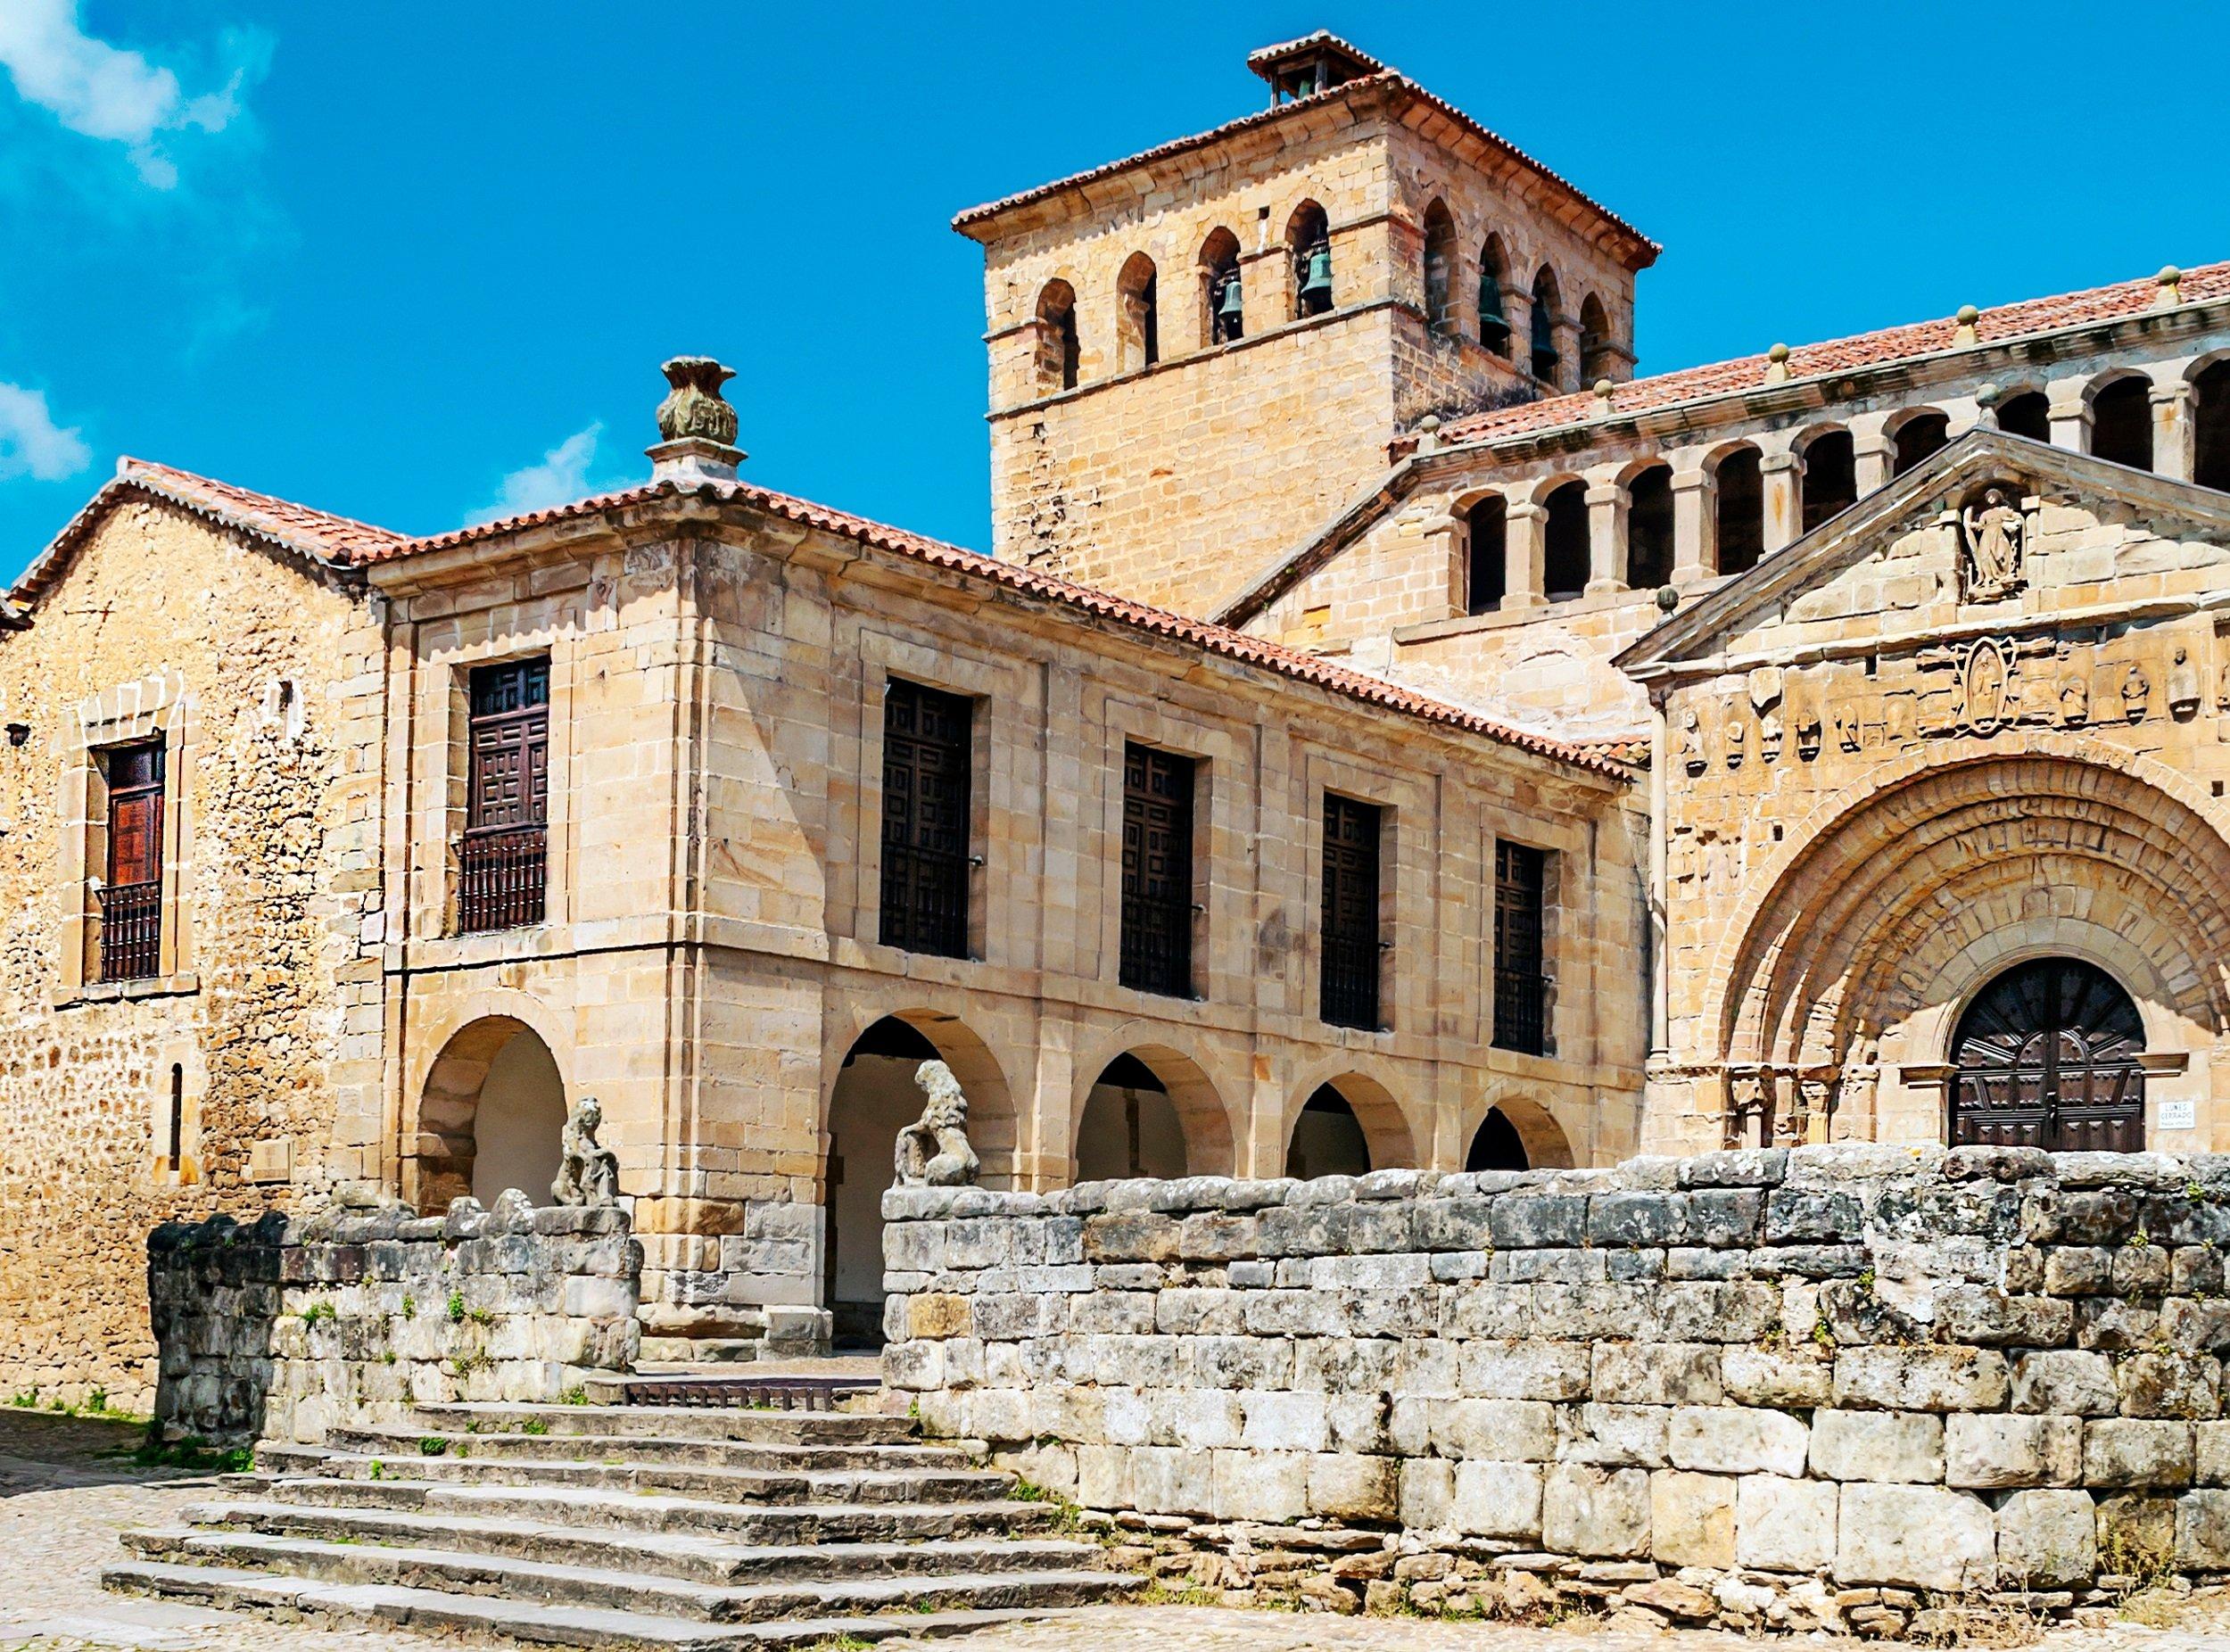 Santillana Del Mar & Altamira Museum Tour From Santander